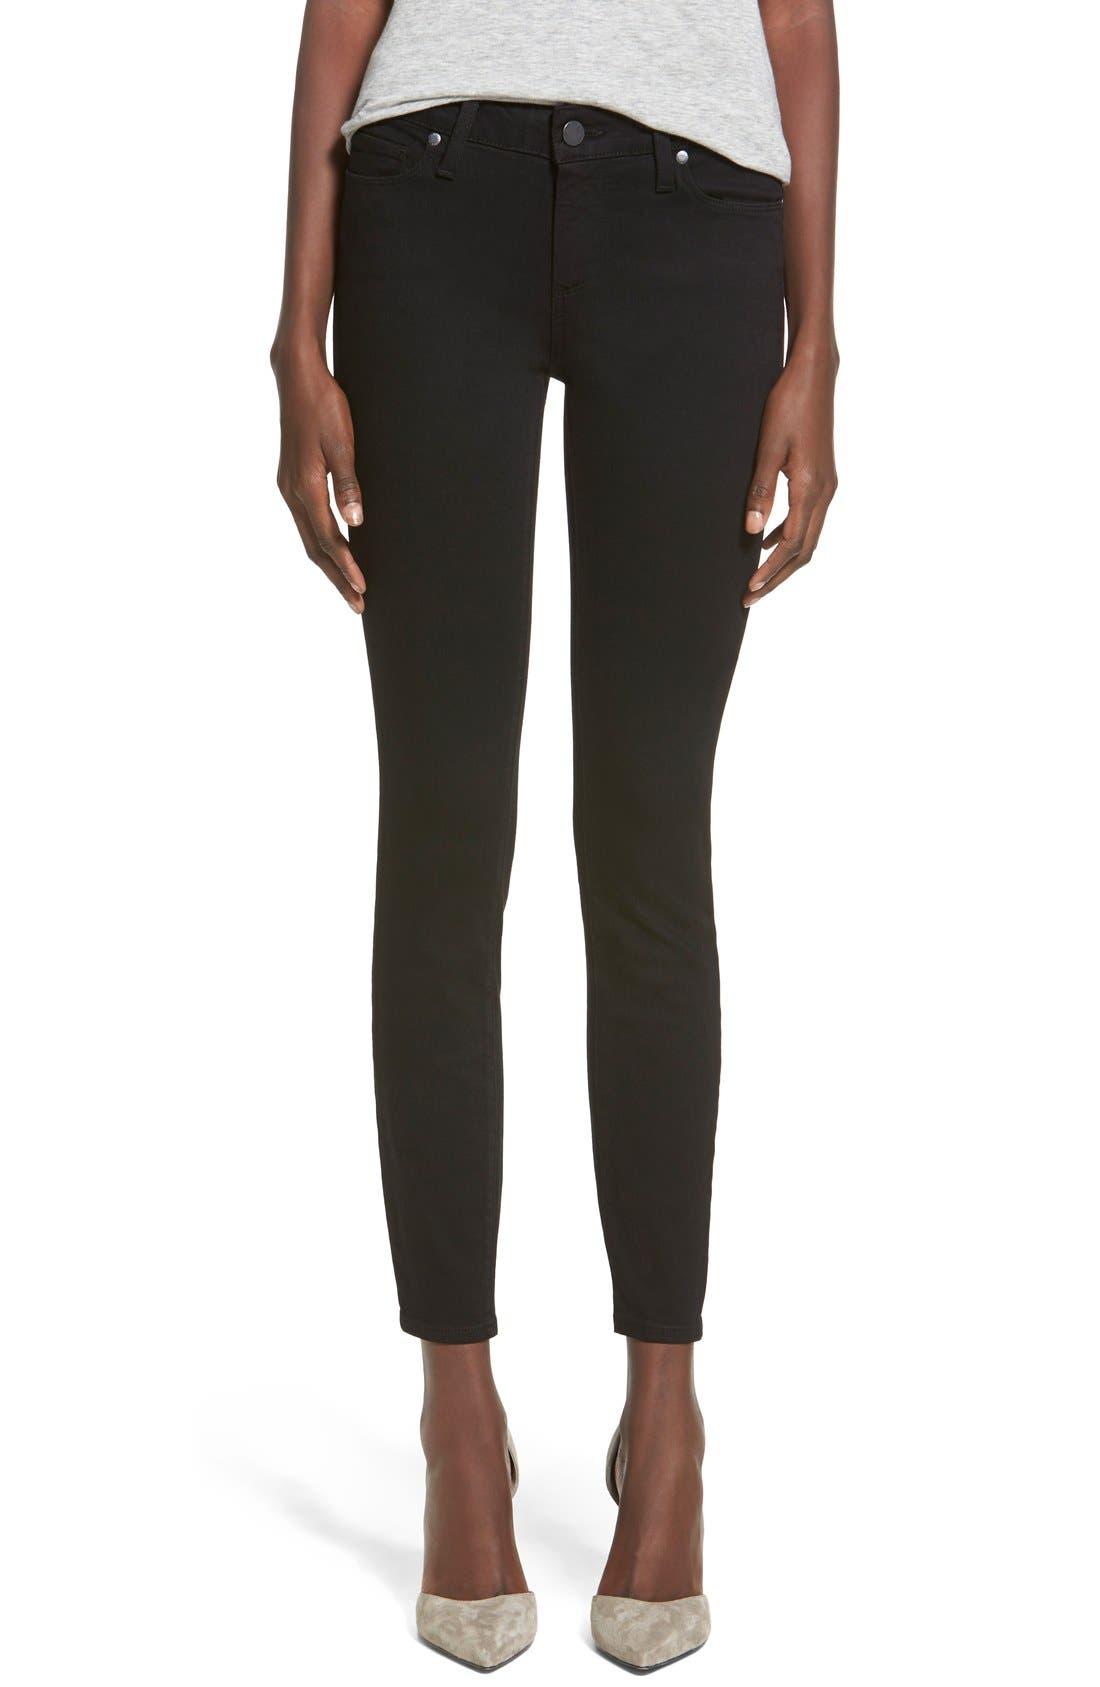 Alternate Image 1 Selected - PAIGE 'Transcend - Verdugo' Ankle Ultra Skinny Jeans (Black Shadow)